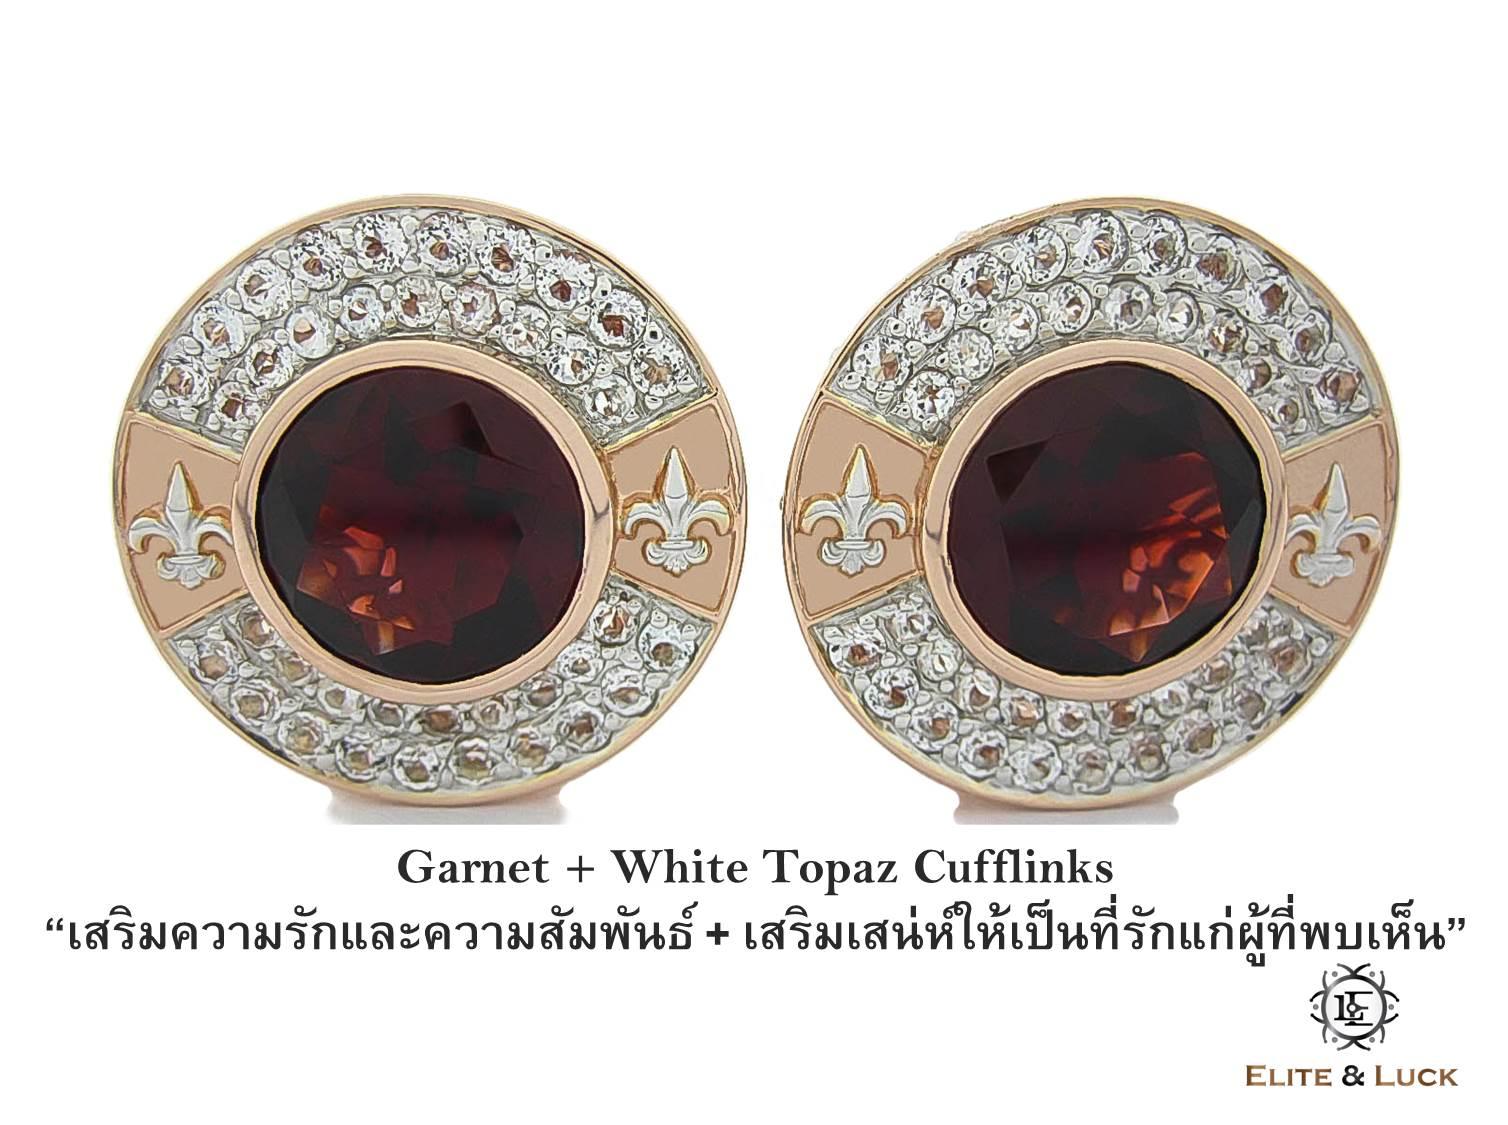 Garnet + White Topaz Sterling Silver Cufflinks สี Rose Gold & Rhodium รุ่น Royal